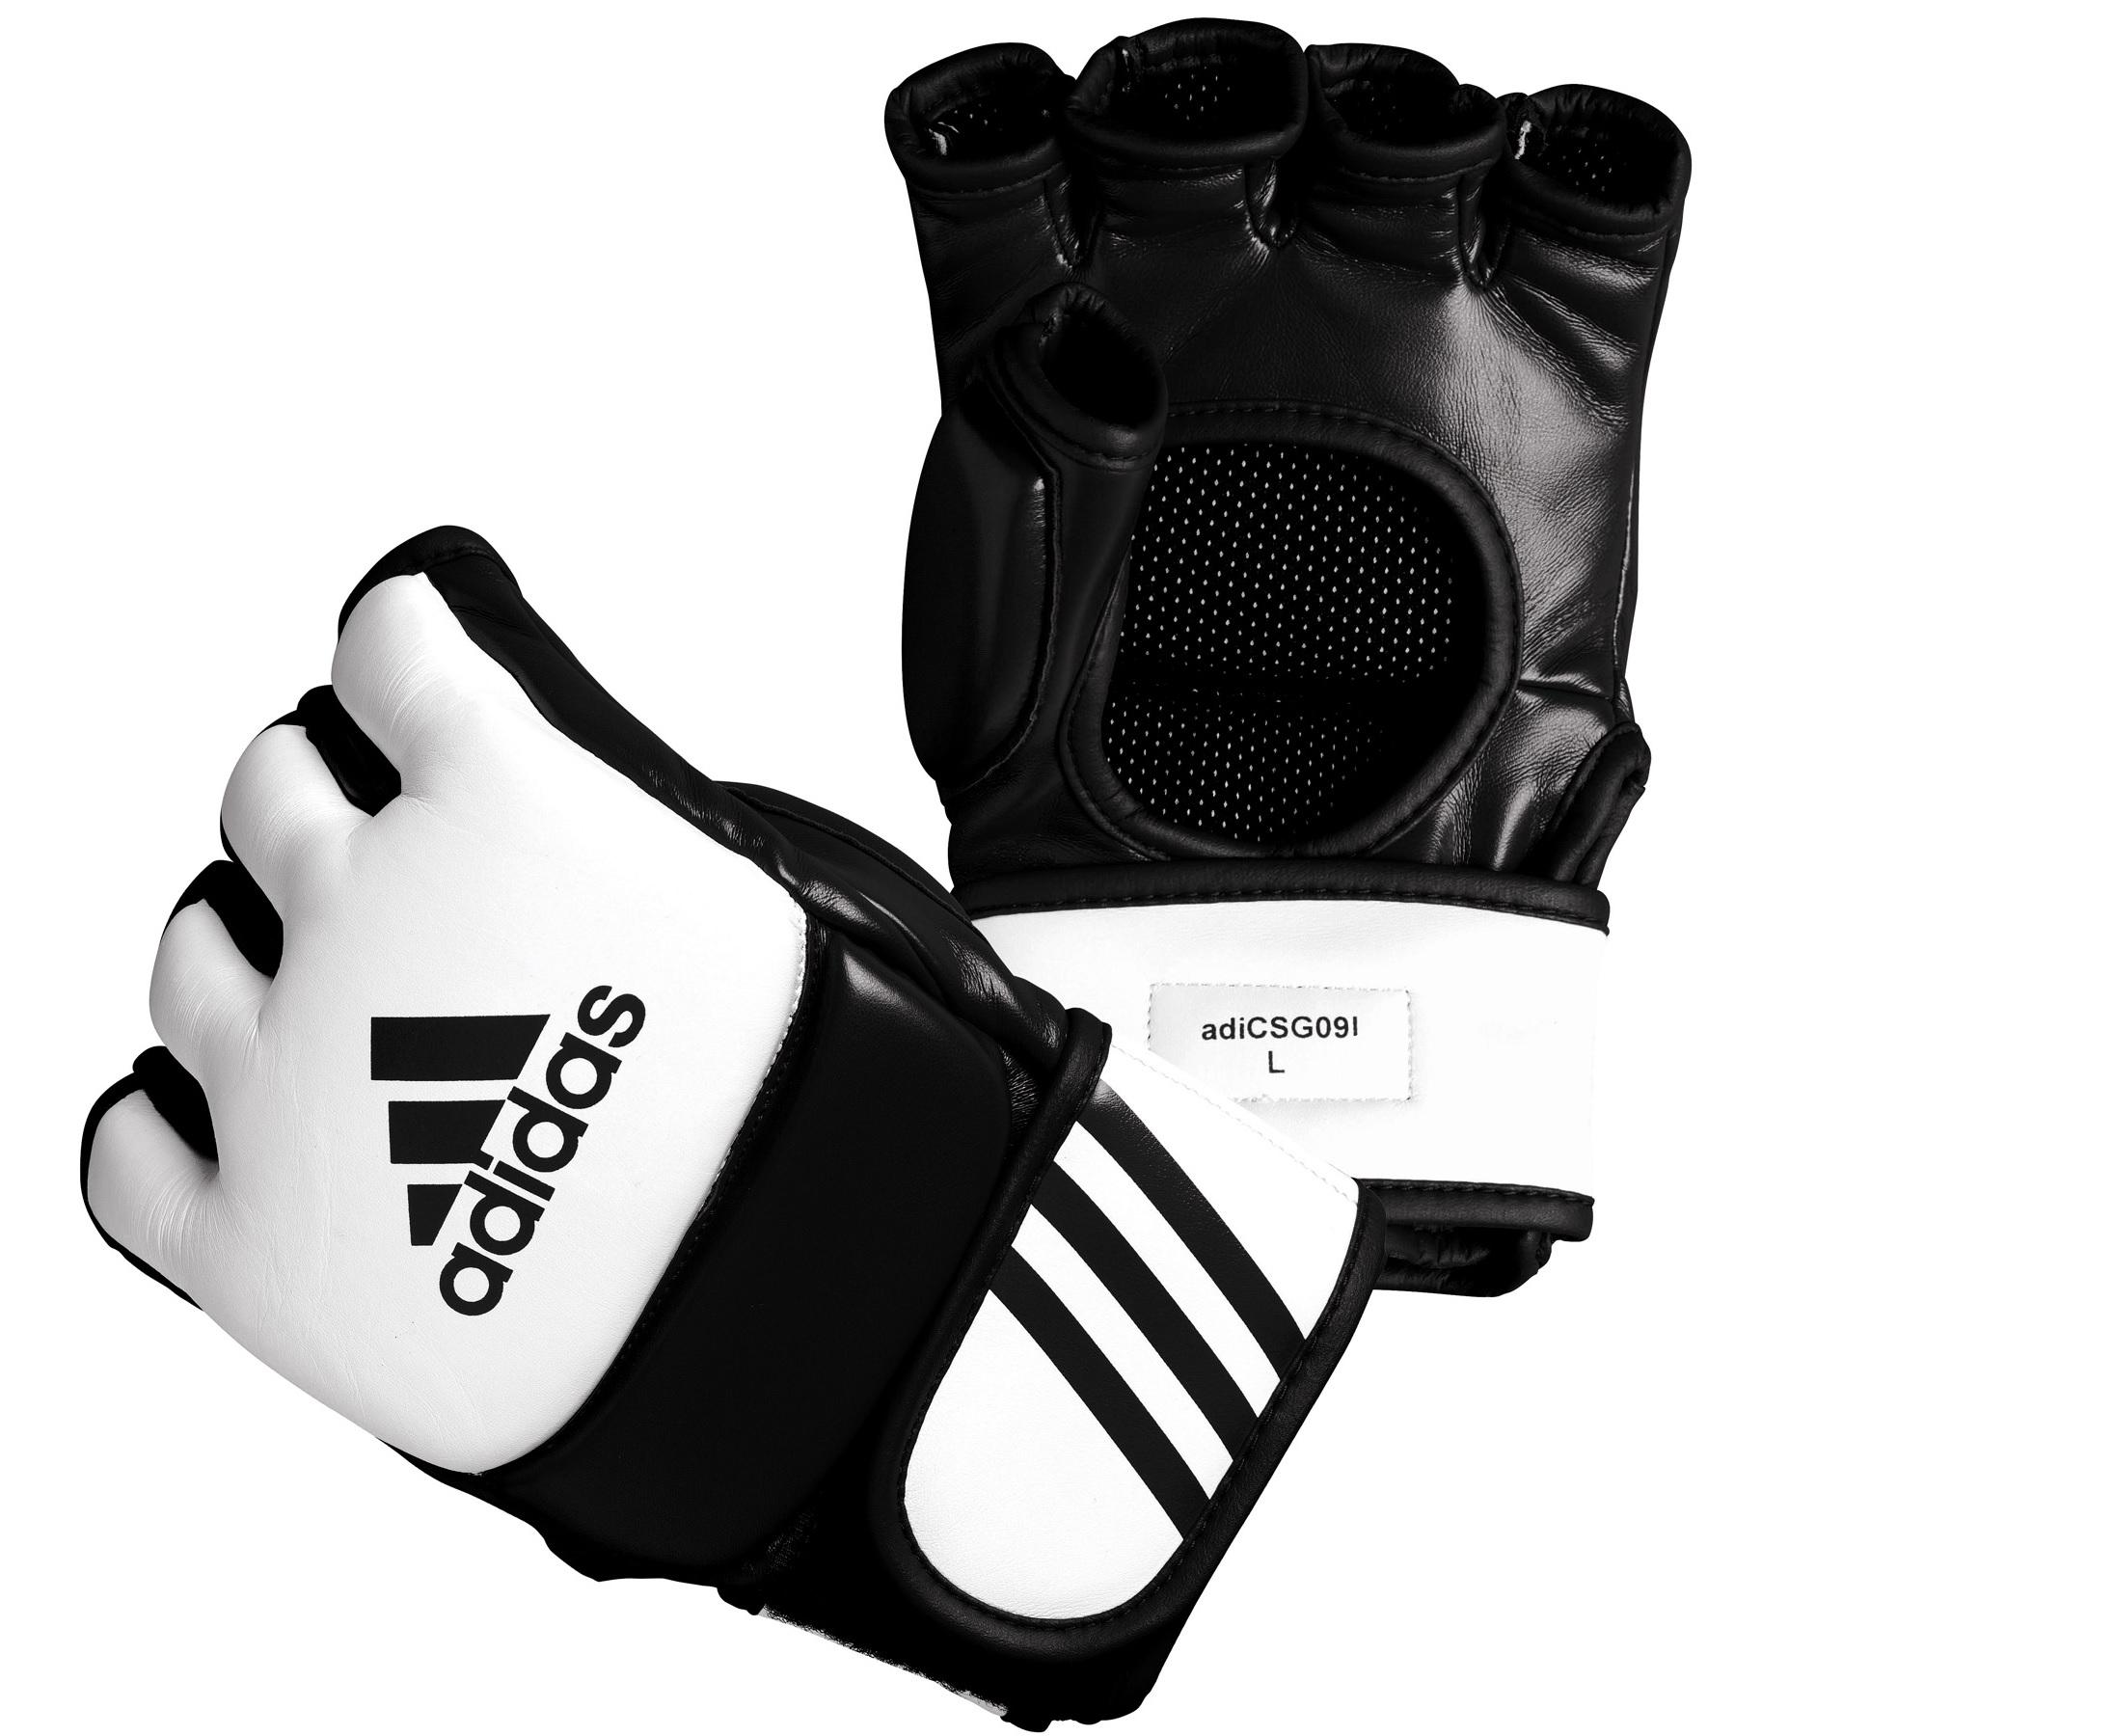 Adidas MMA Competition Handschoenen - Wit/Zwart